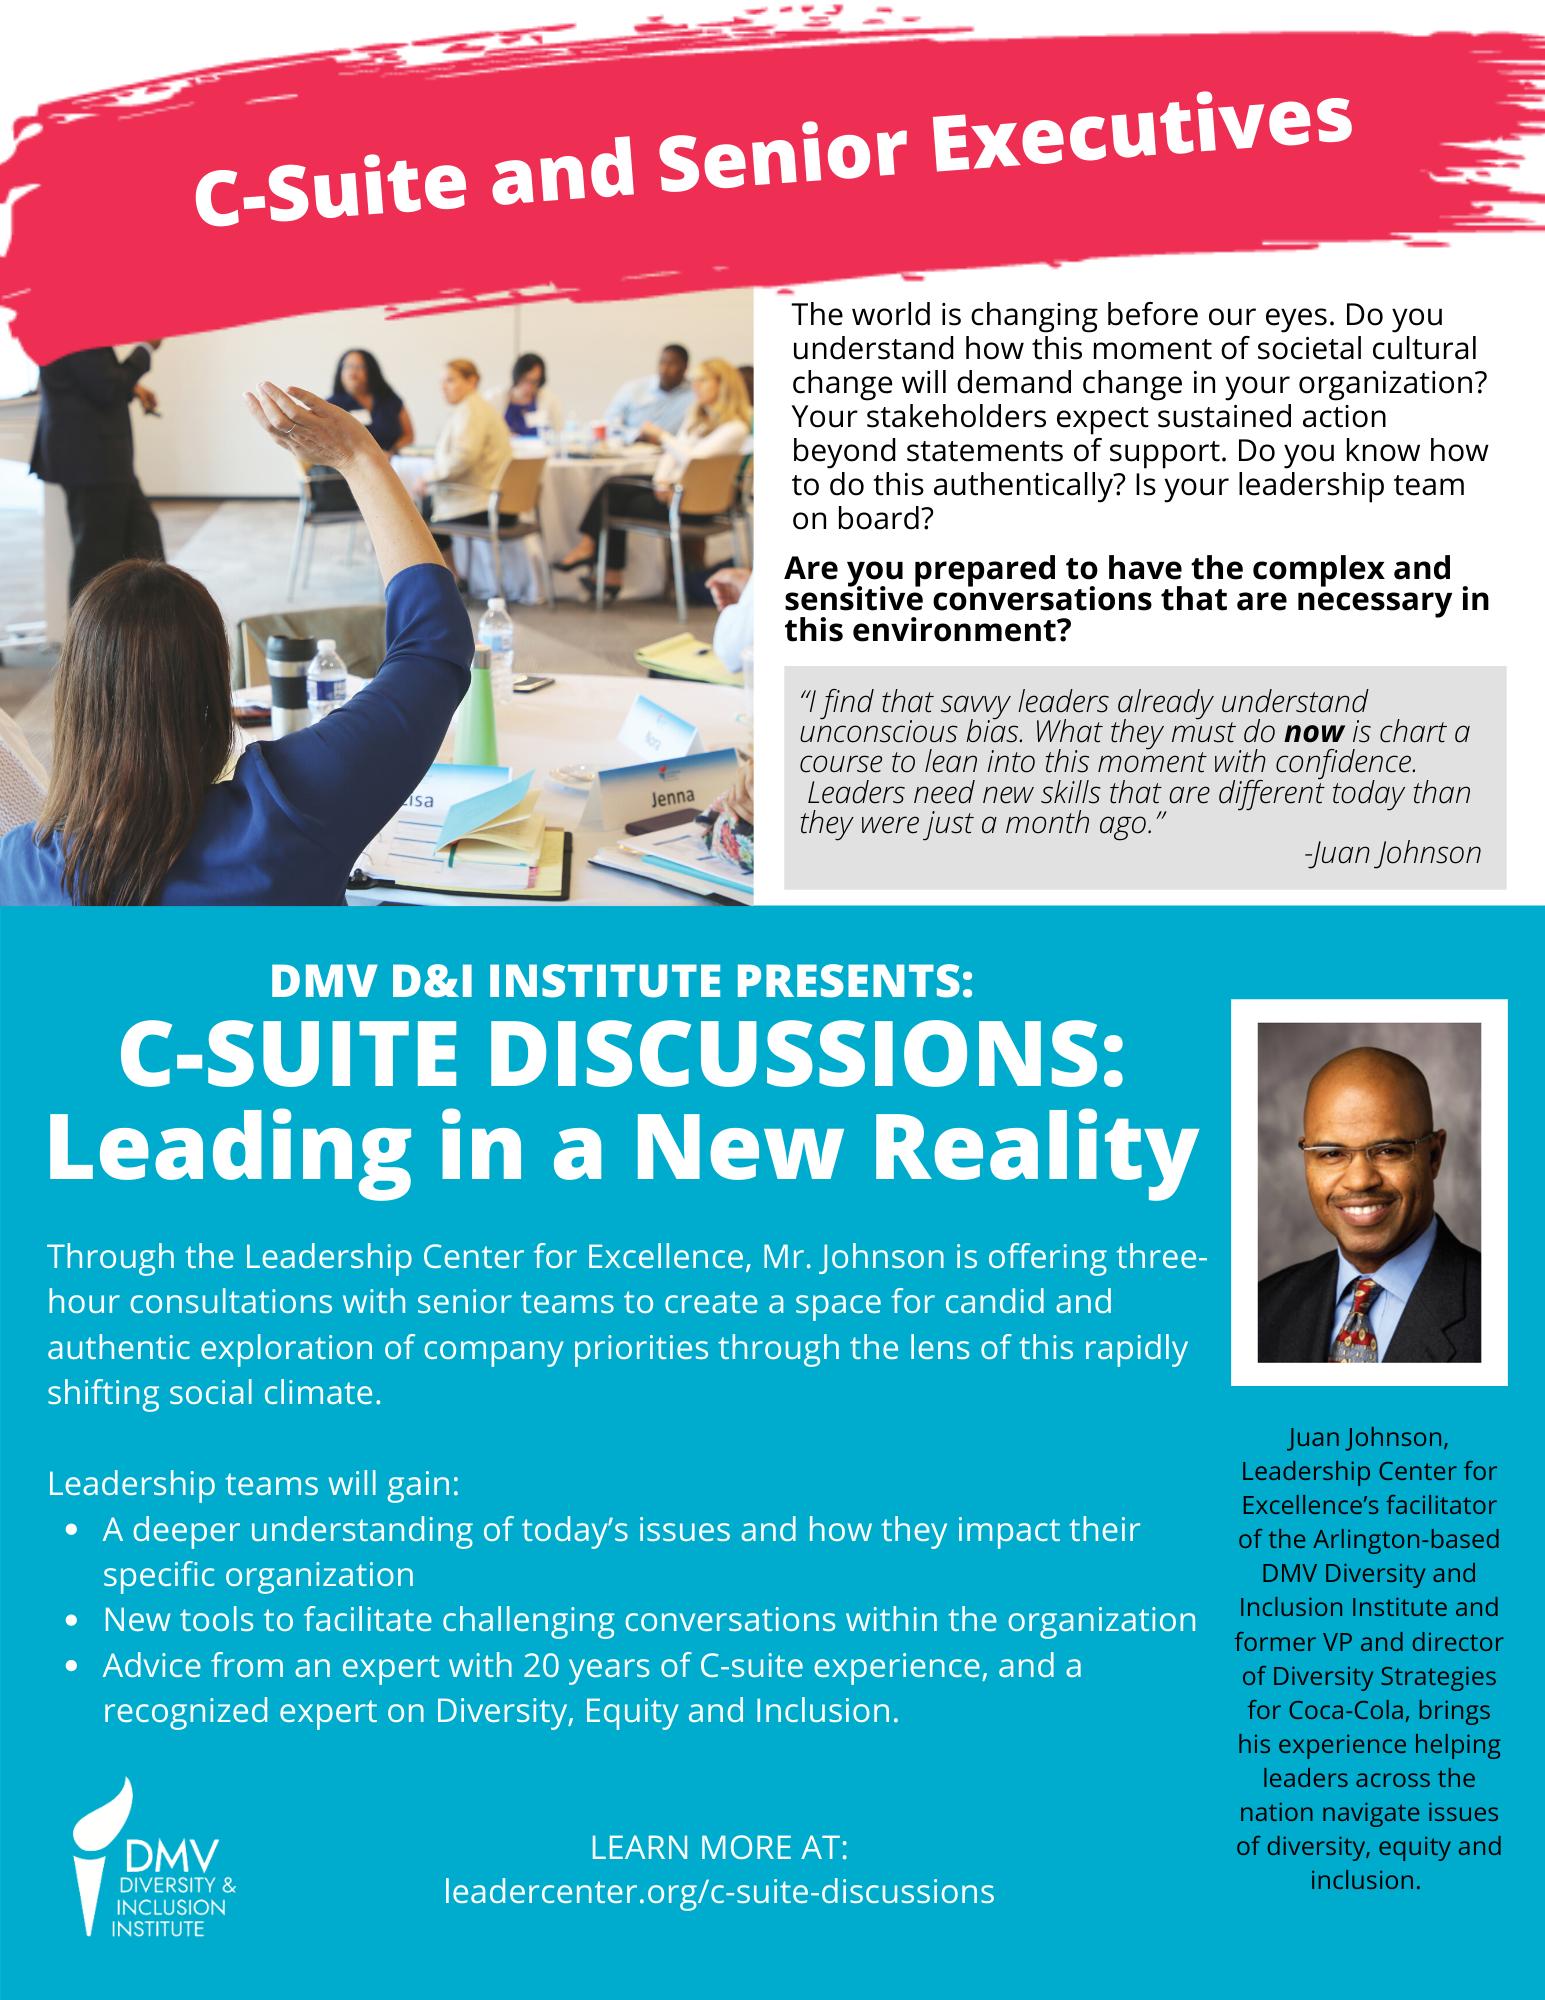 C-Suite and Senior Executives